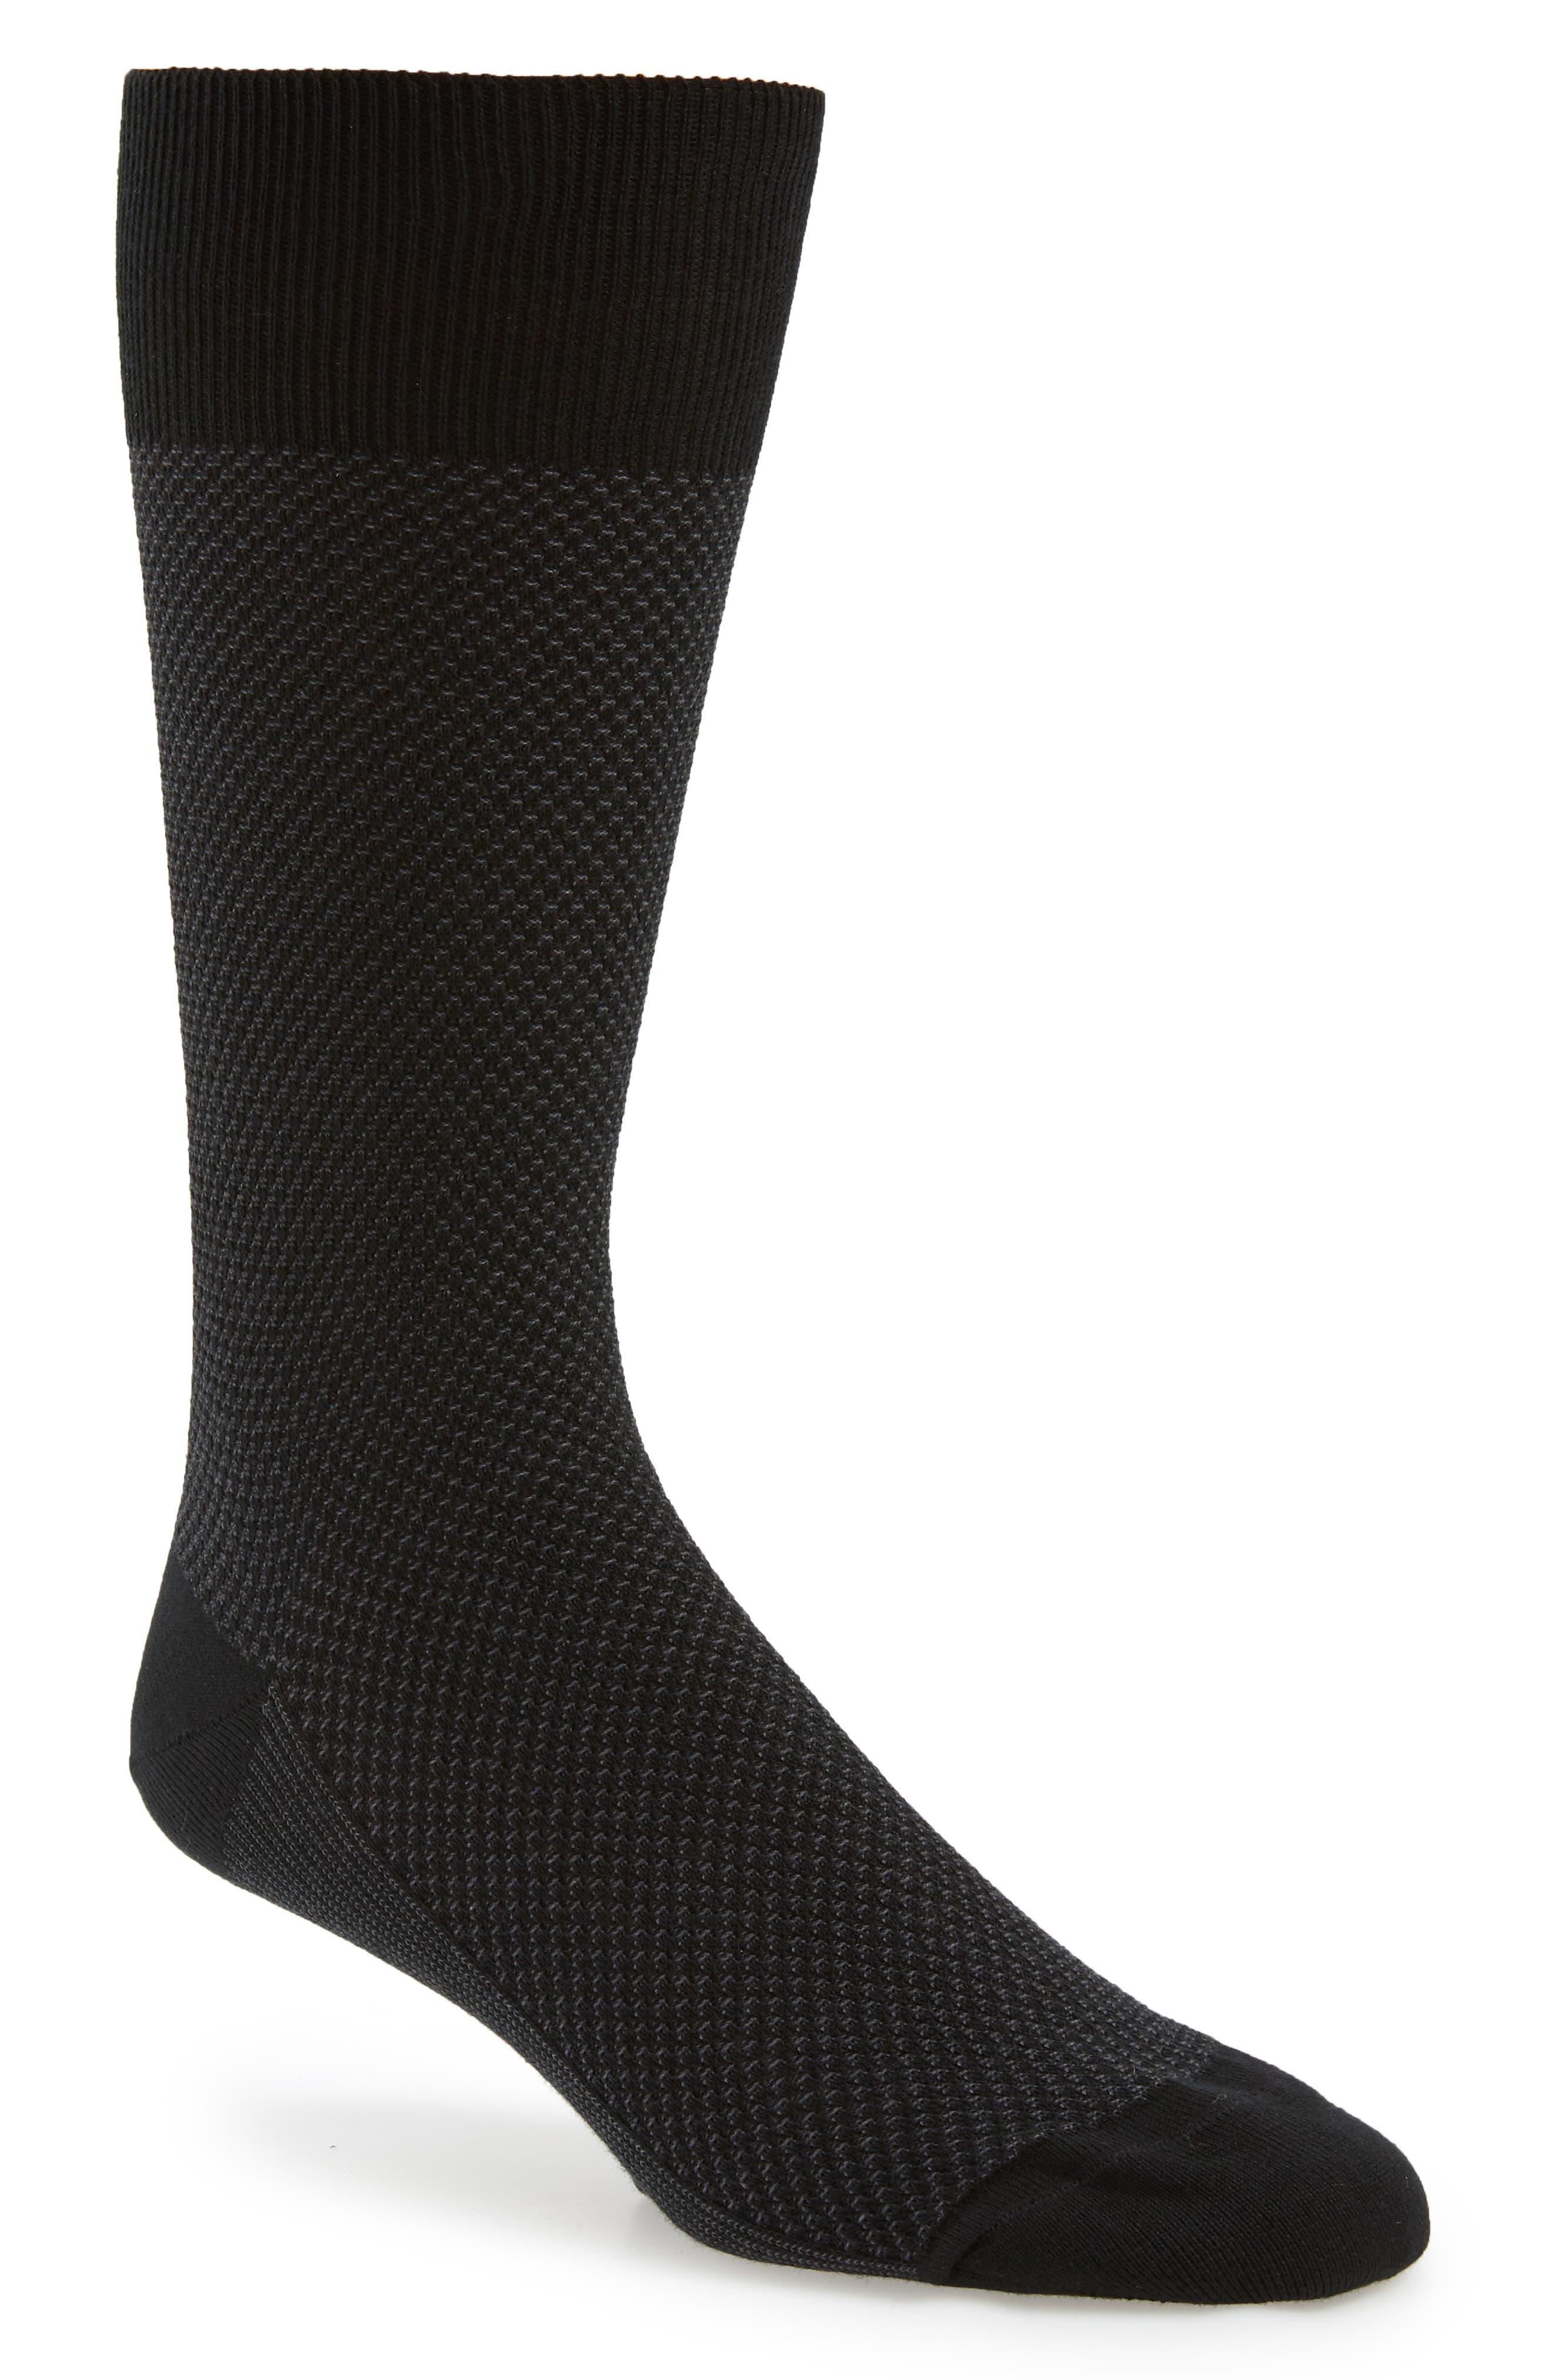 Waffle Texture Socks,                             Main thumbnail 1, color,                             001